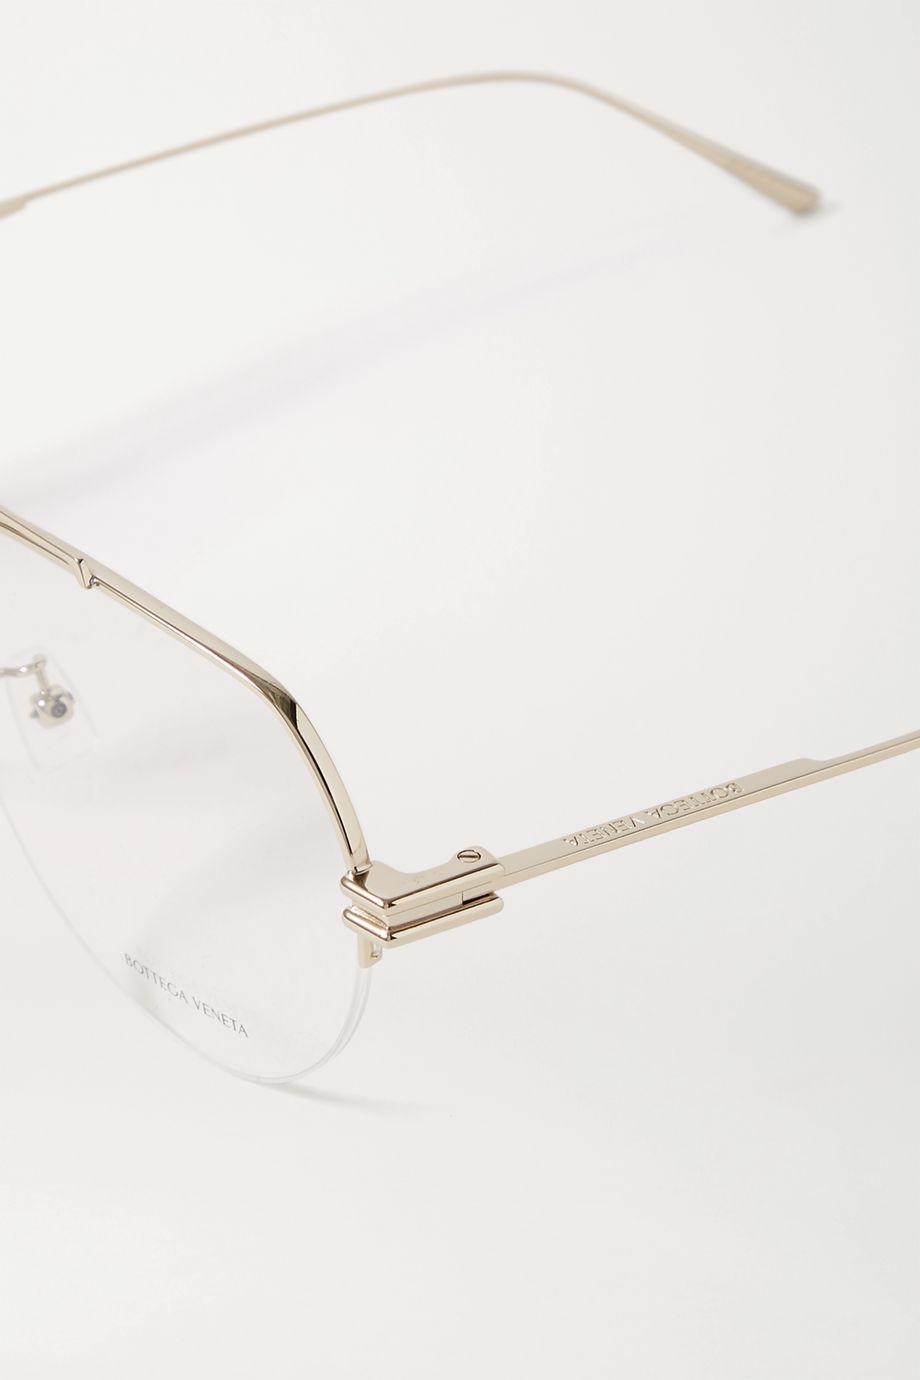 Bottega Veneta 金色金属飞行员光学眼镜